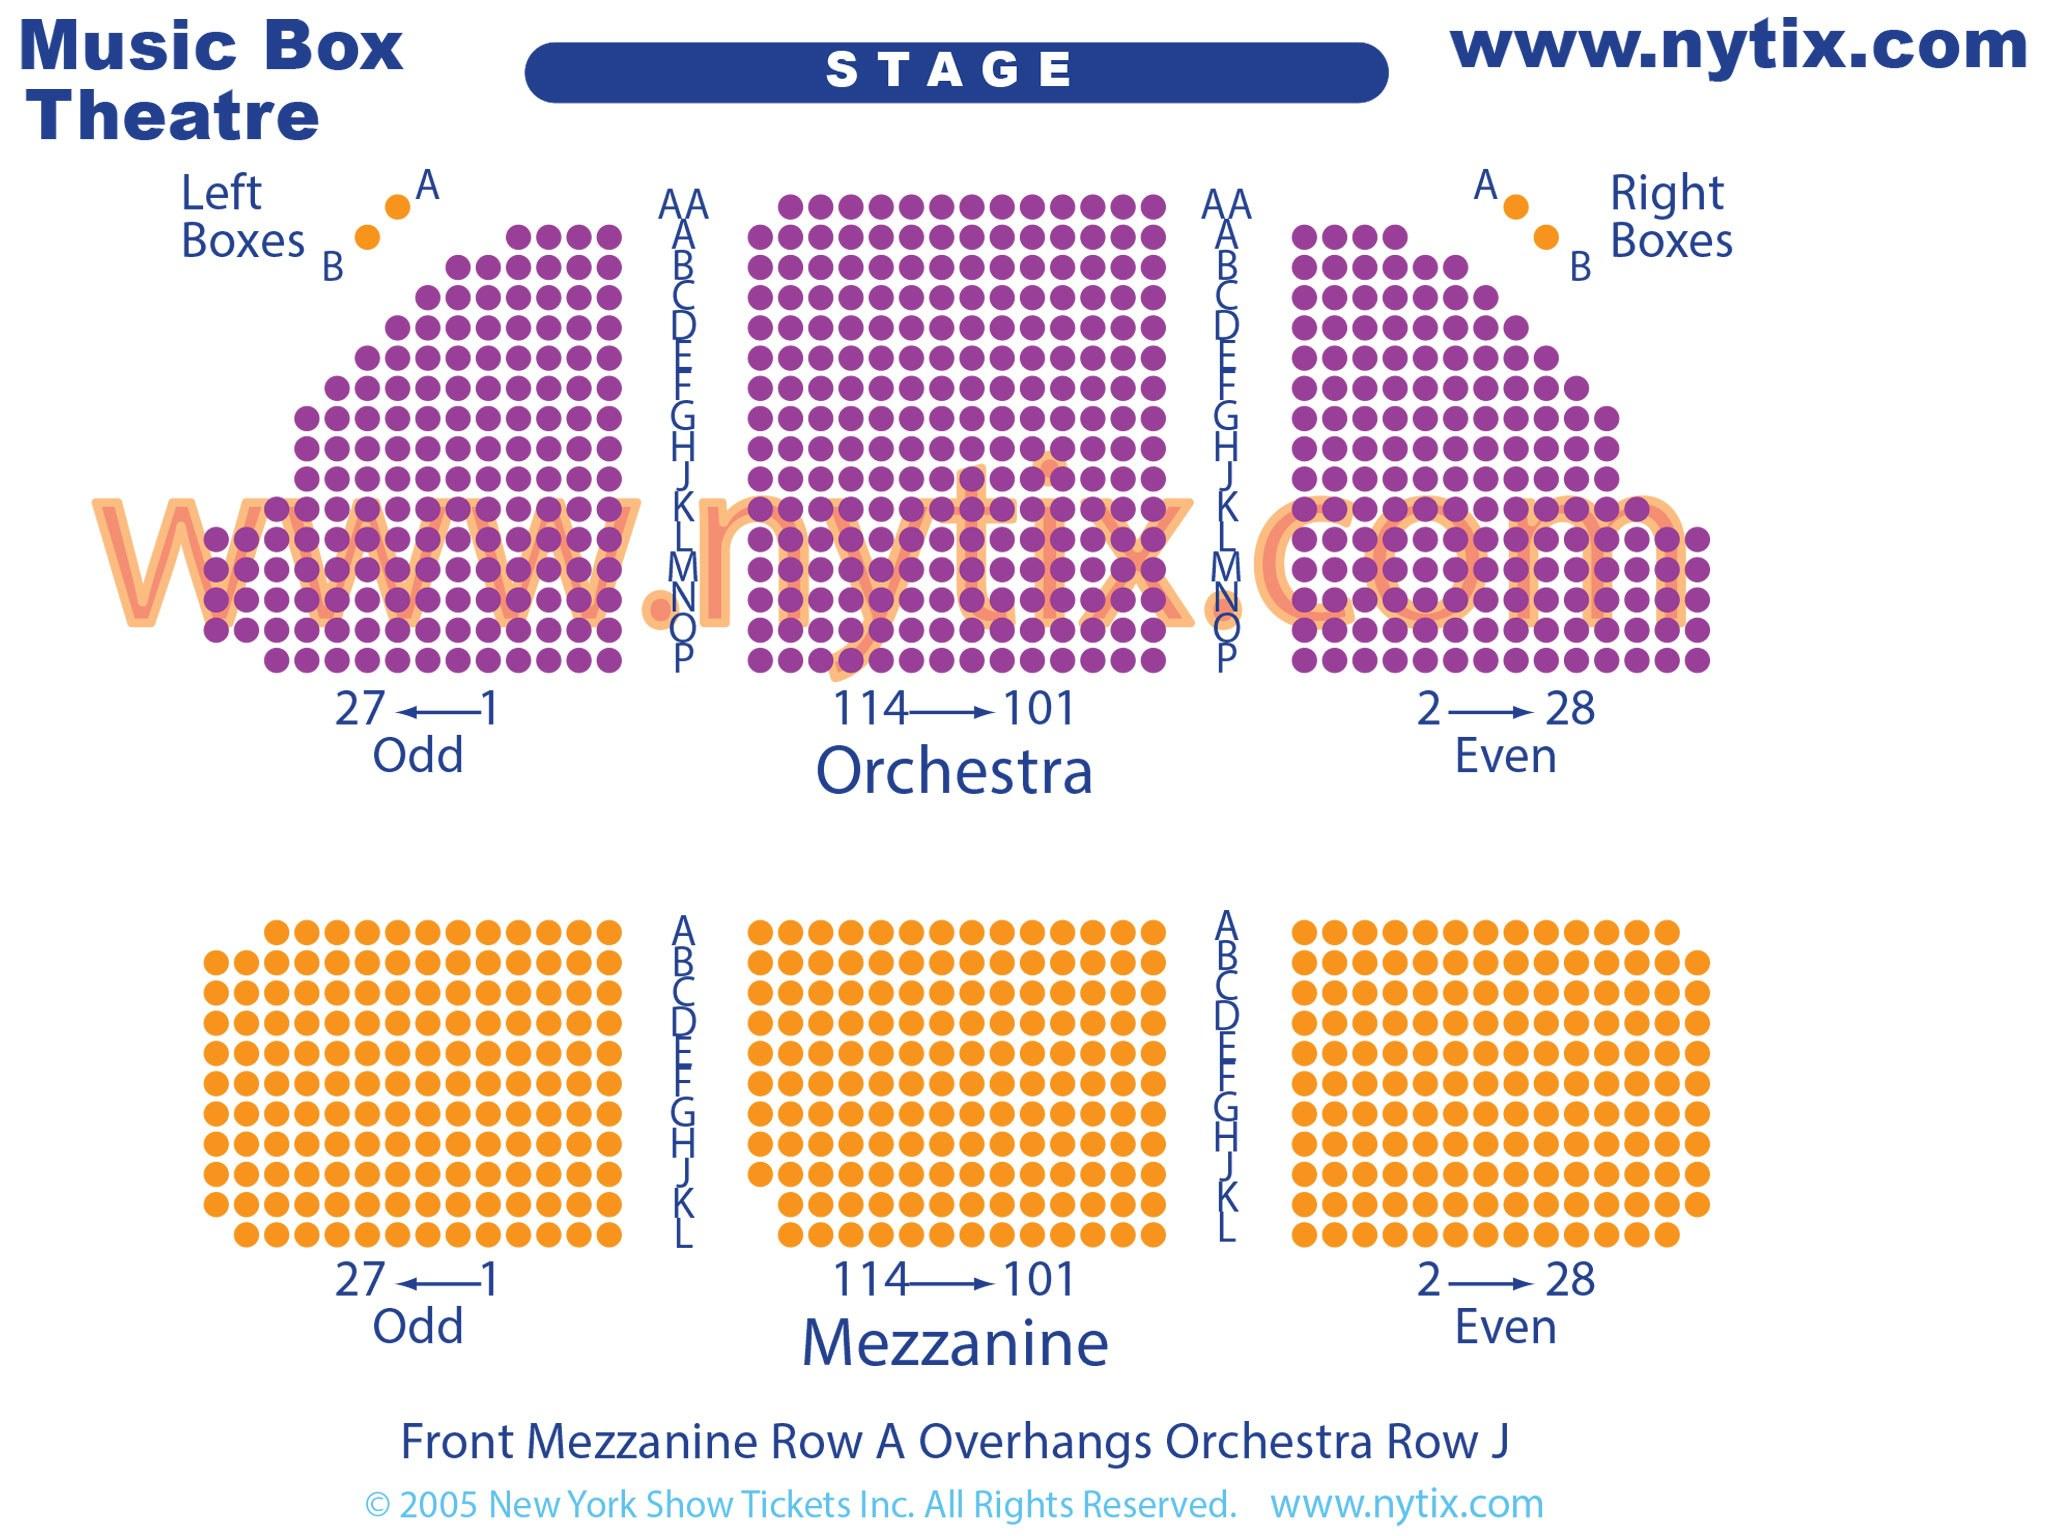 Music Box Theatre Seating Chart